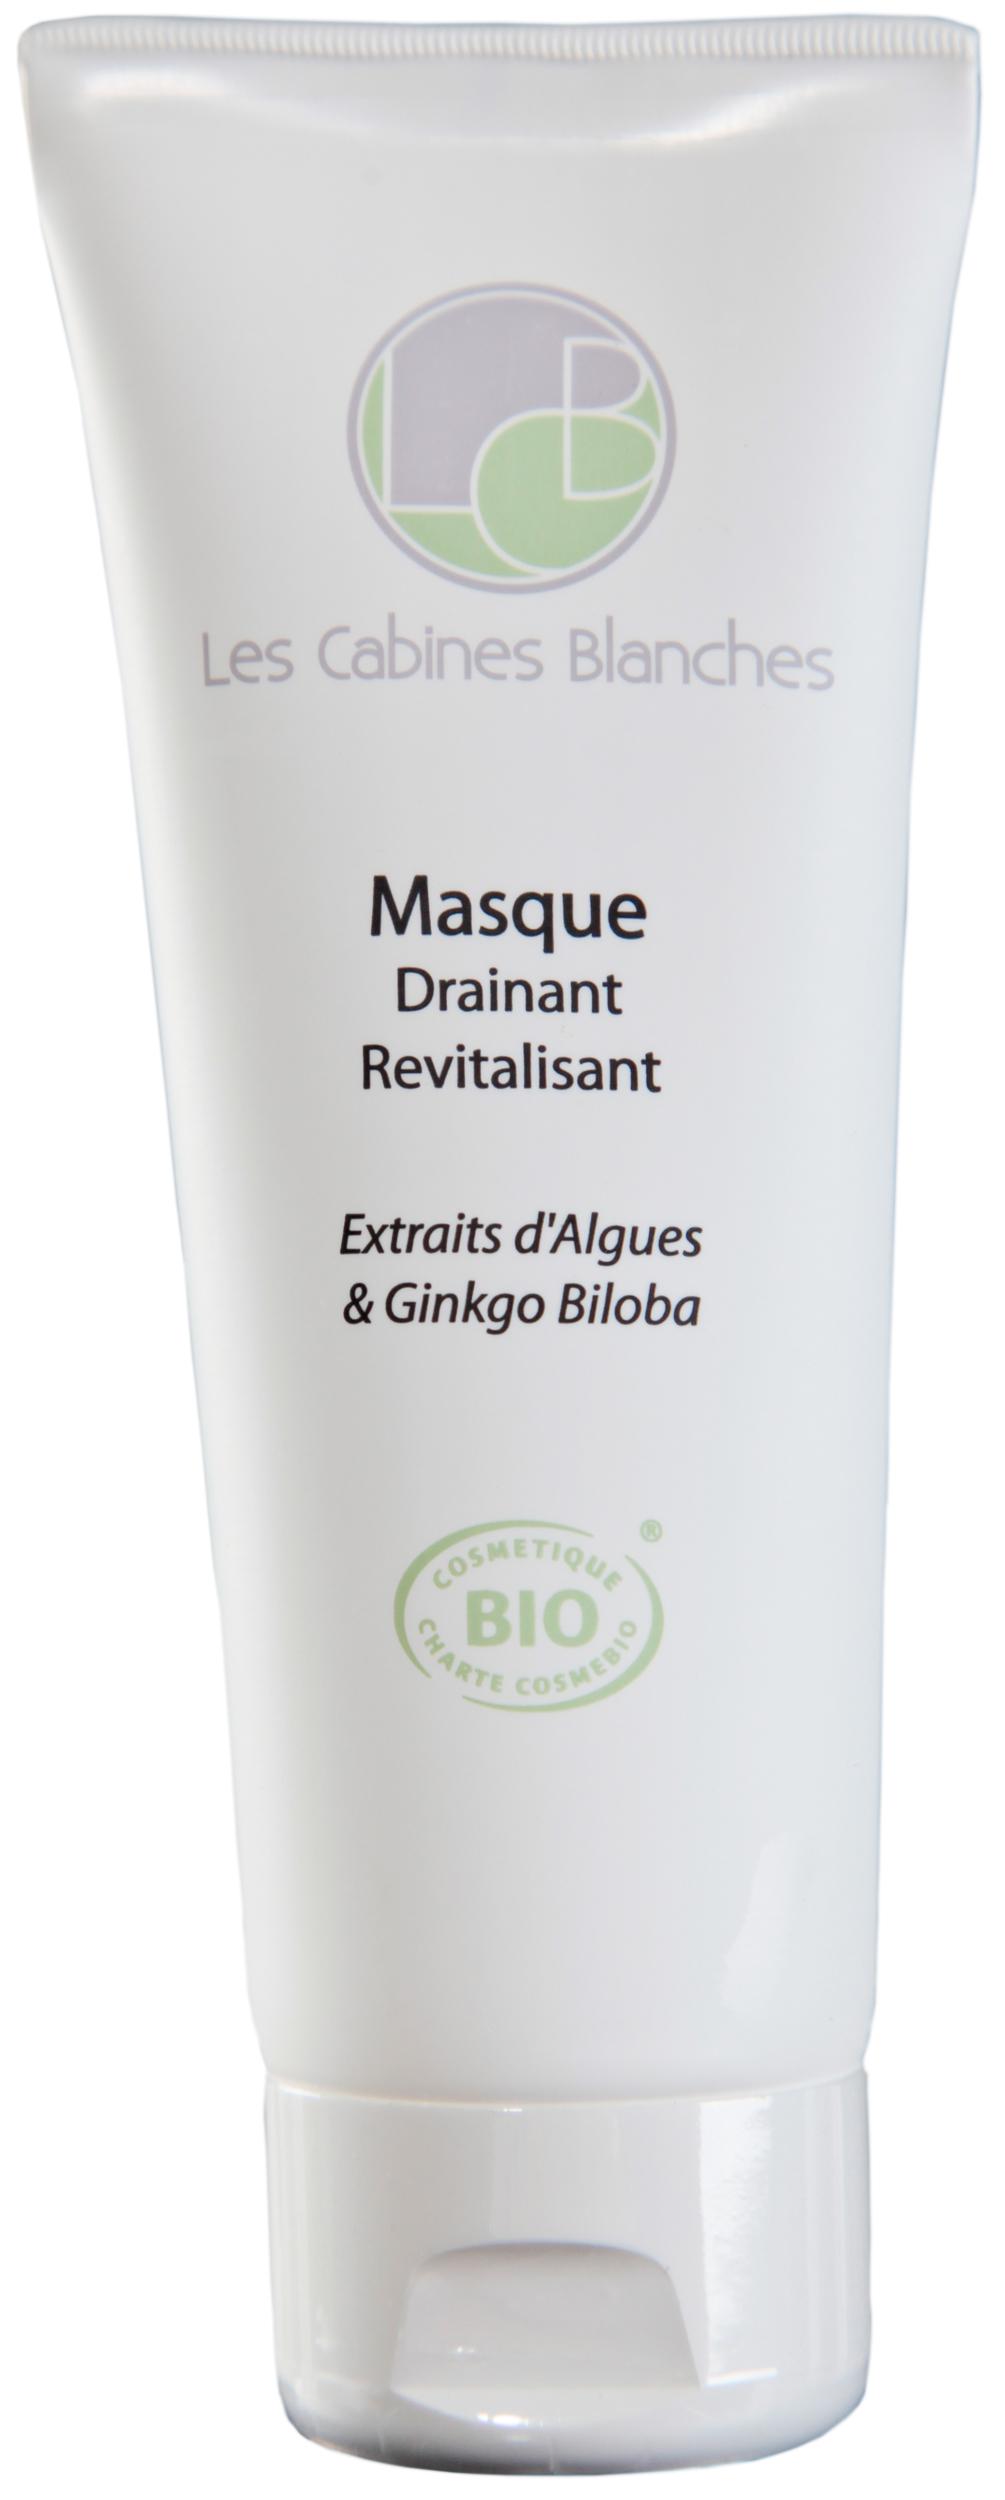 Doux Good - Les Cabines Blanches - Masque revitalisant bio